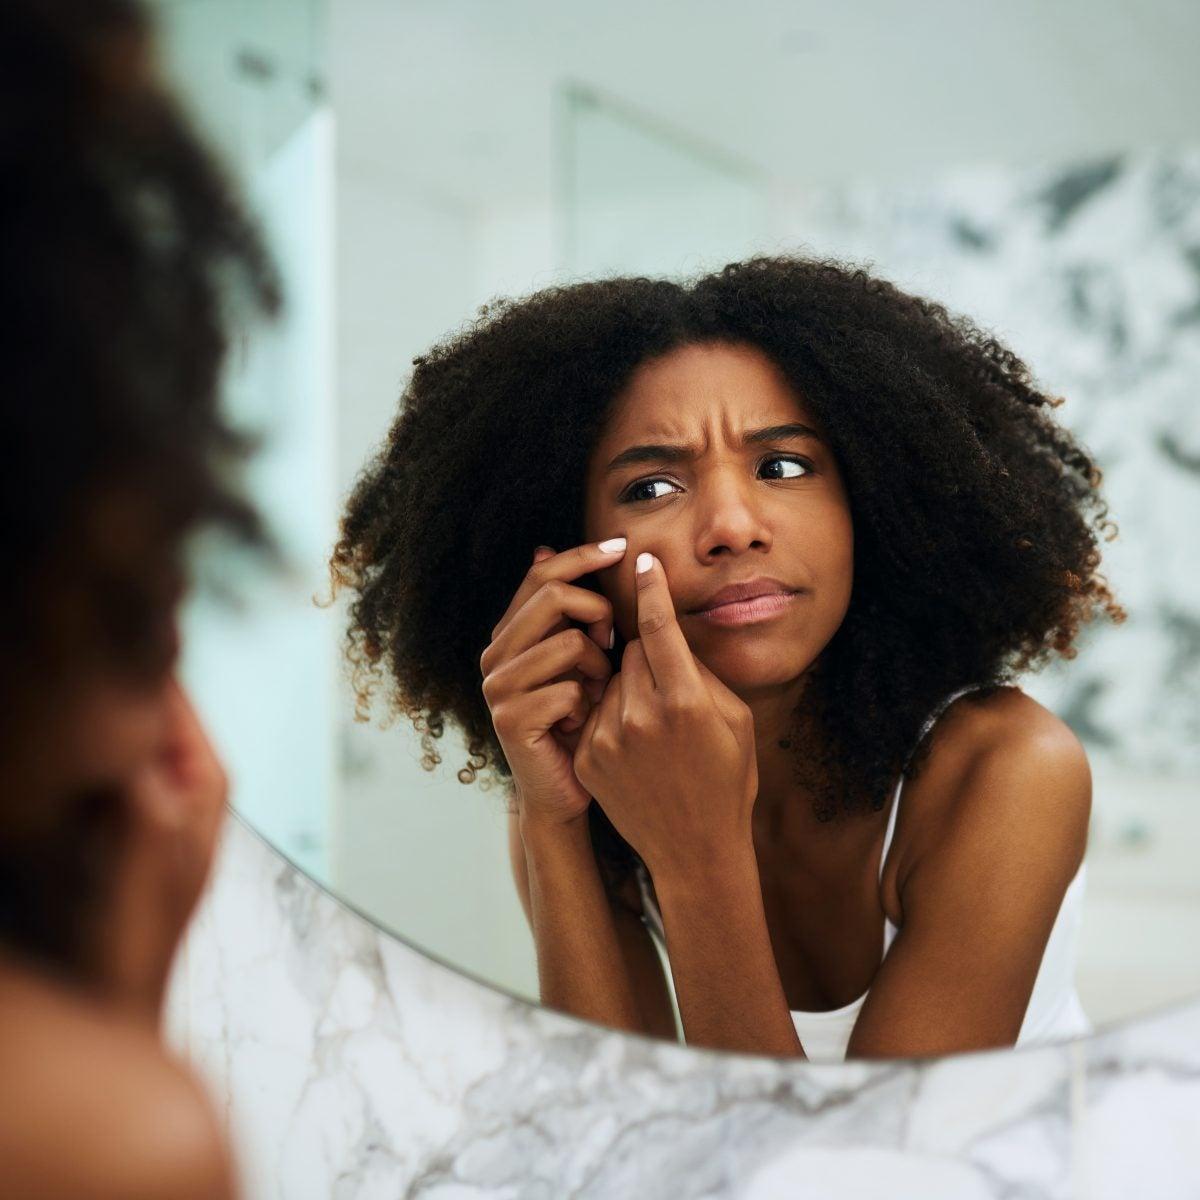 A Black Dermatologist Explains How To Clear Up Those Stubborn Dark Spots